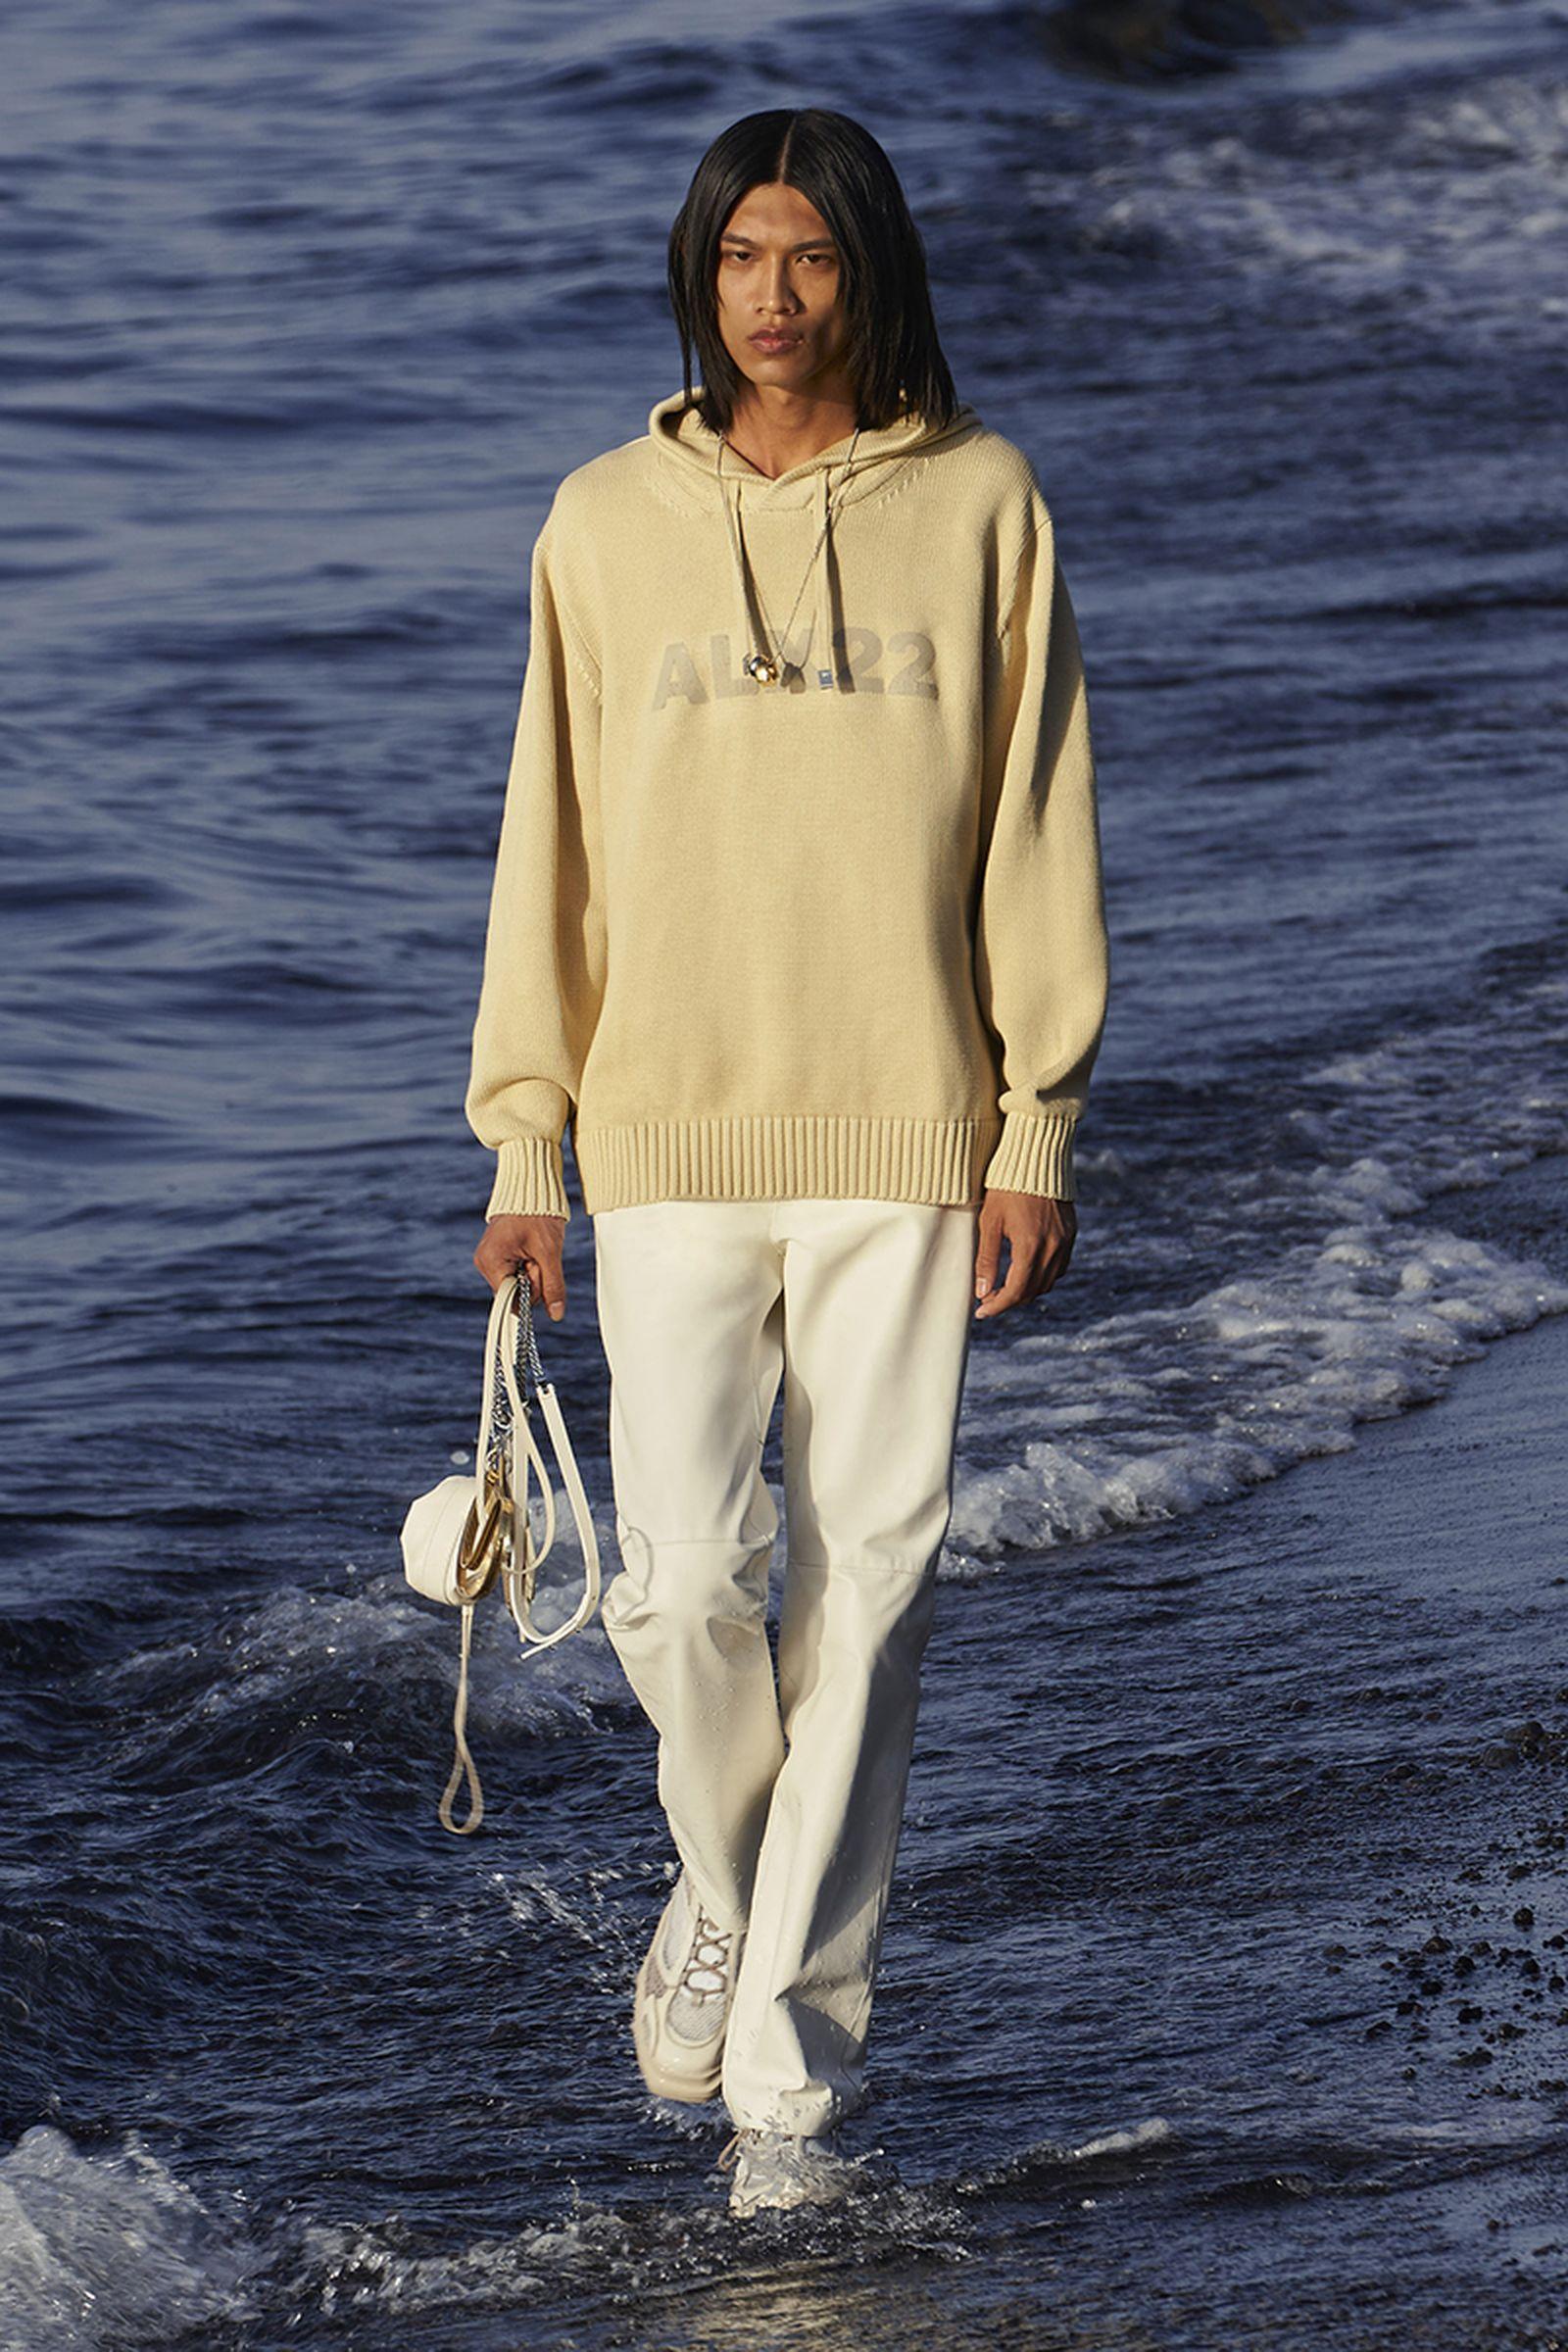 1017-alyx-9sm-spring summer 2022 menswear collection (3)